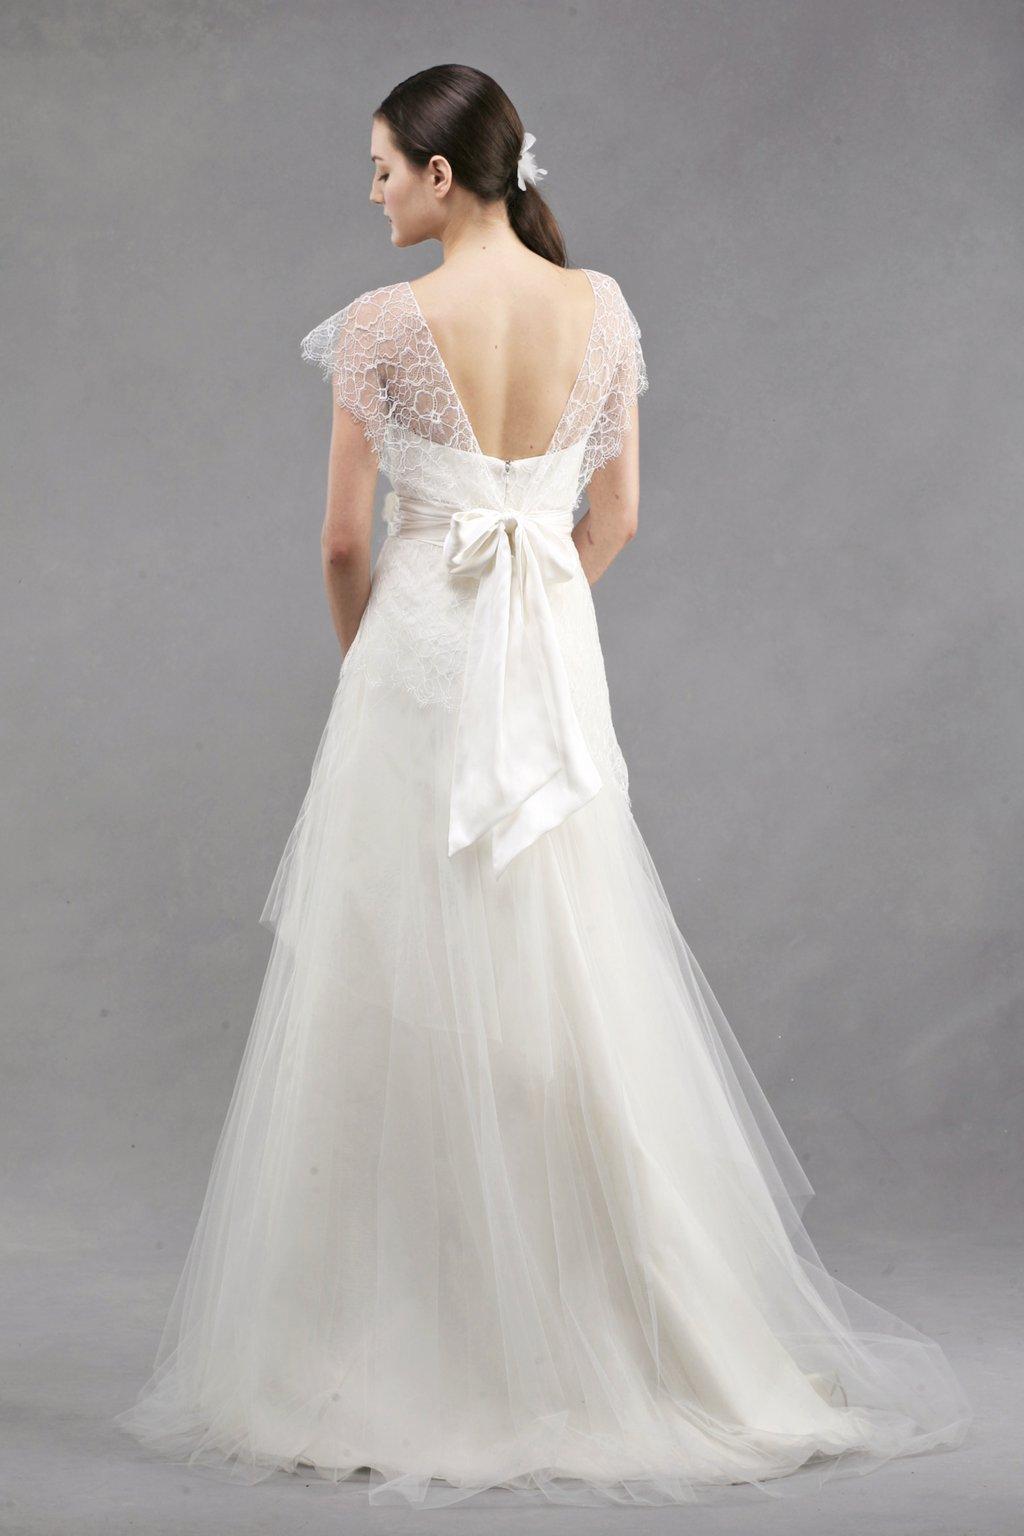 Wedding-dress-by-jenny-yoo-spring-2013-bridal-arianna-back.full